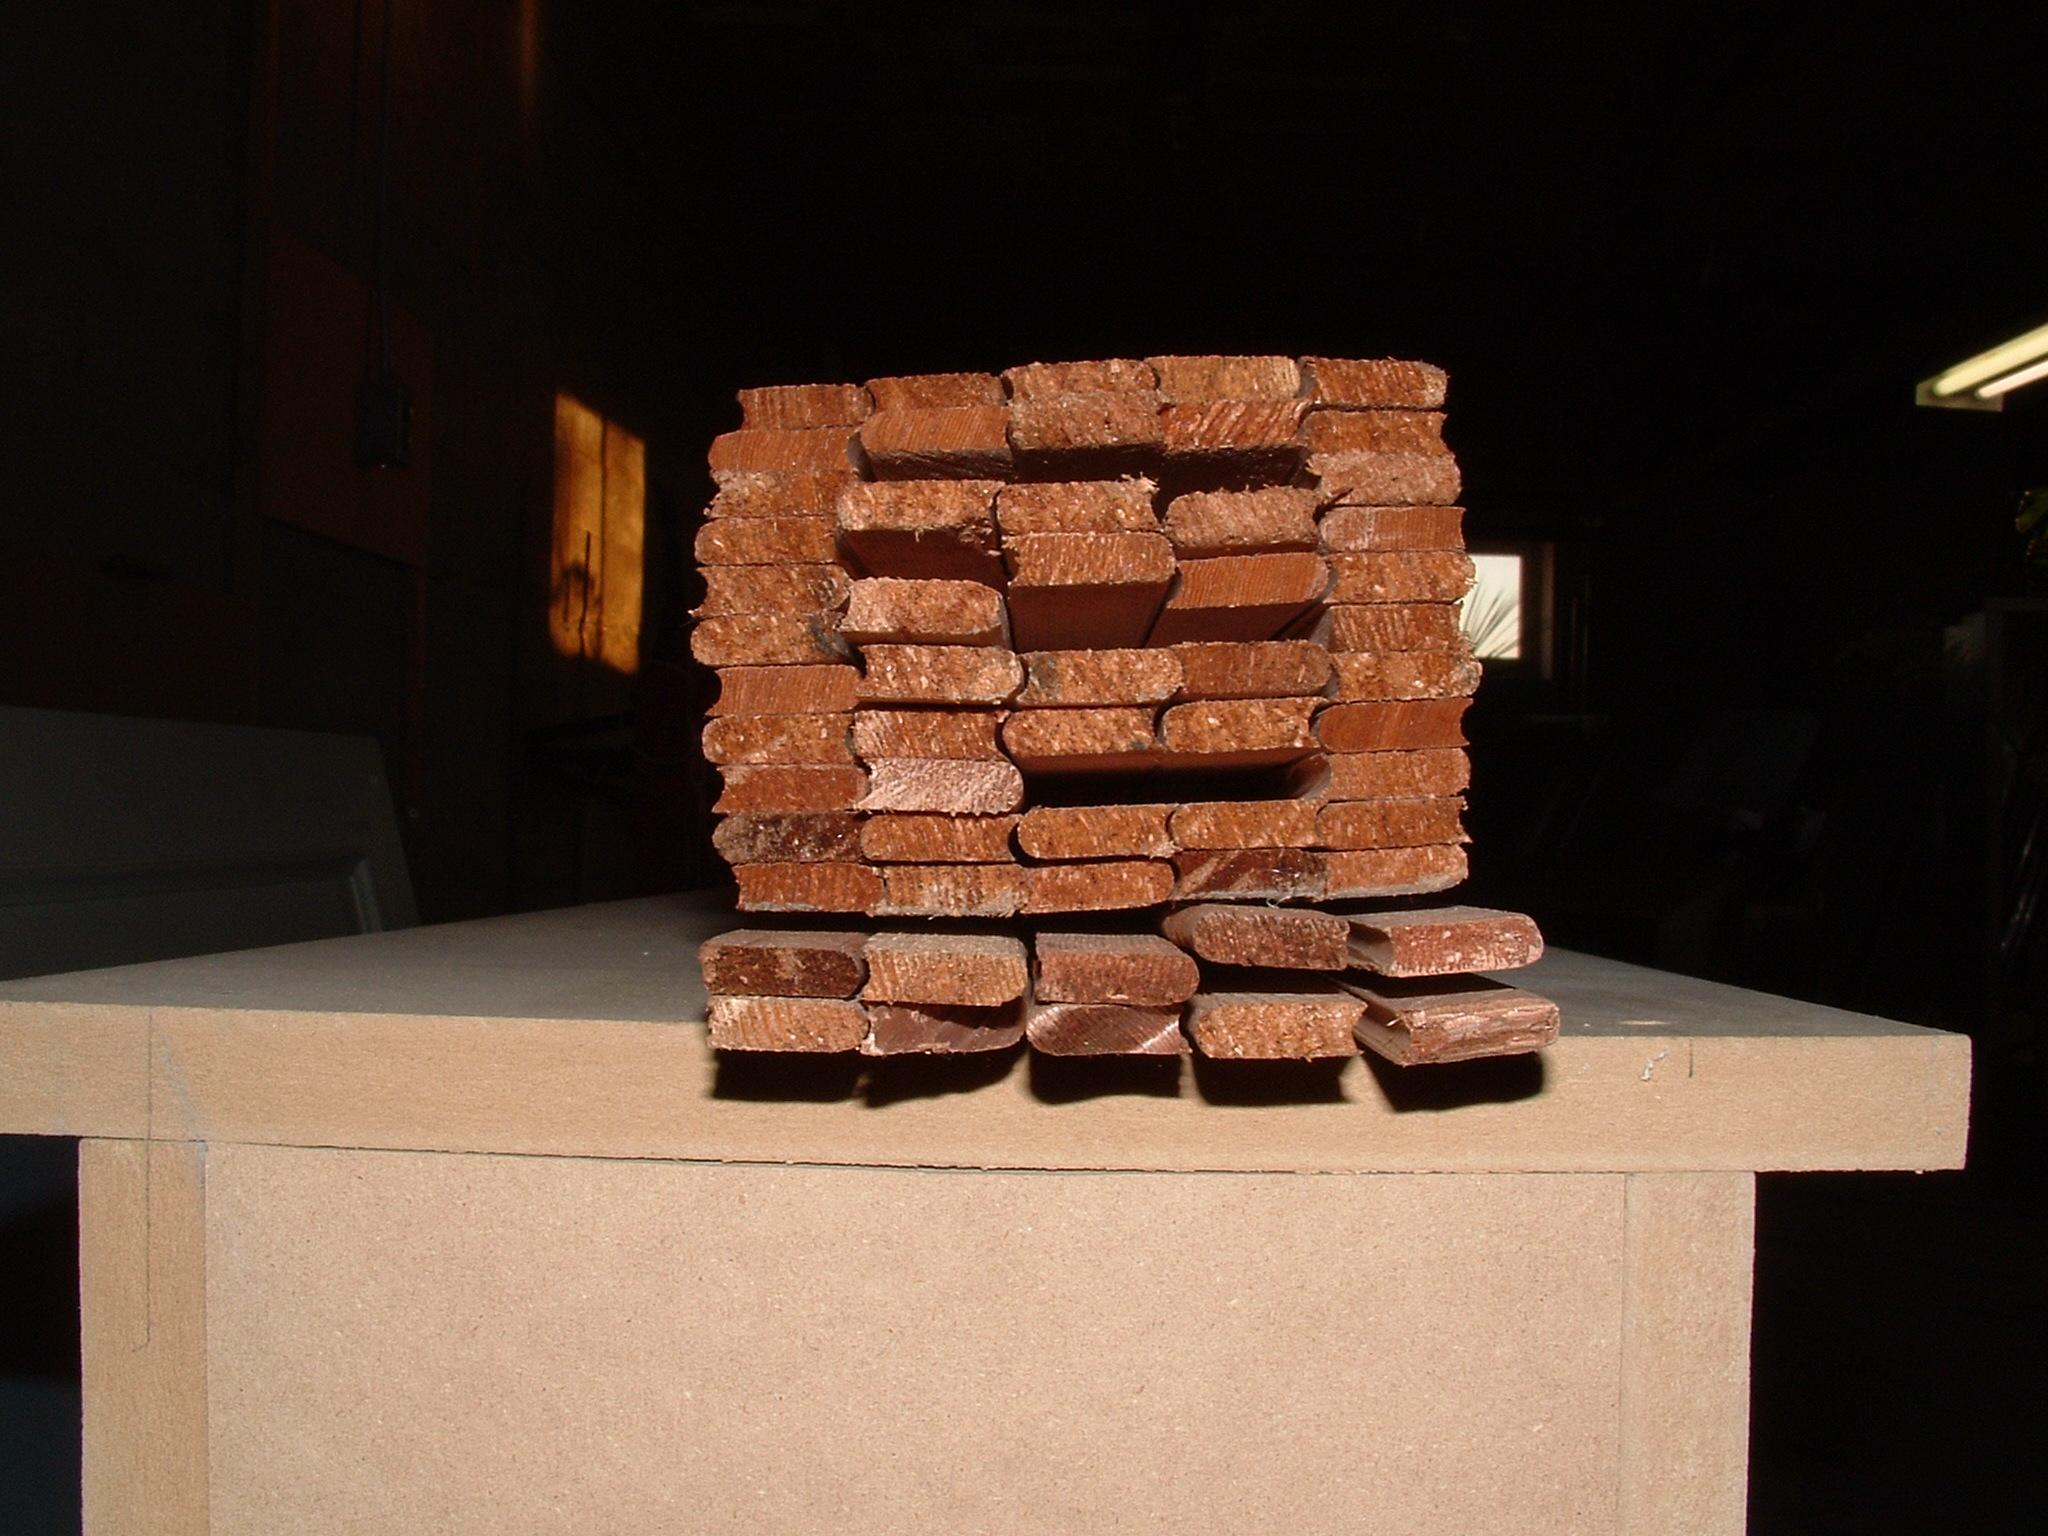 Ends of the cedar strips